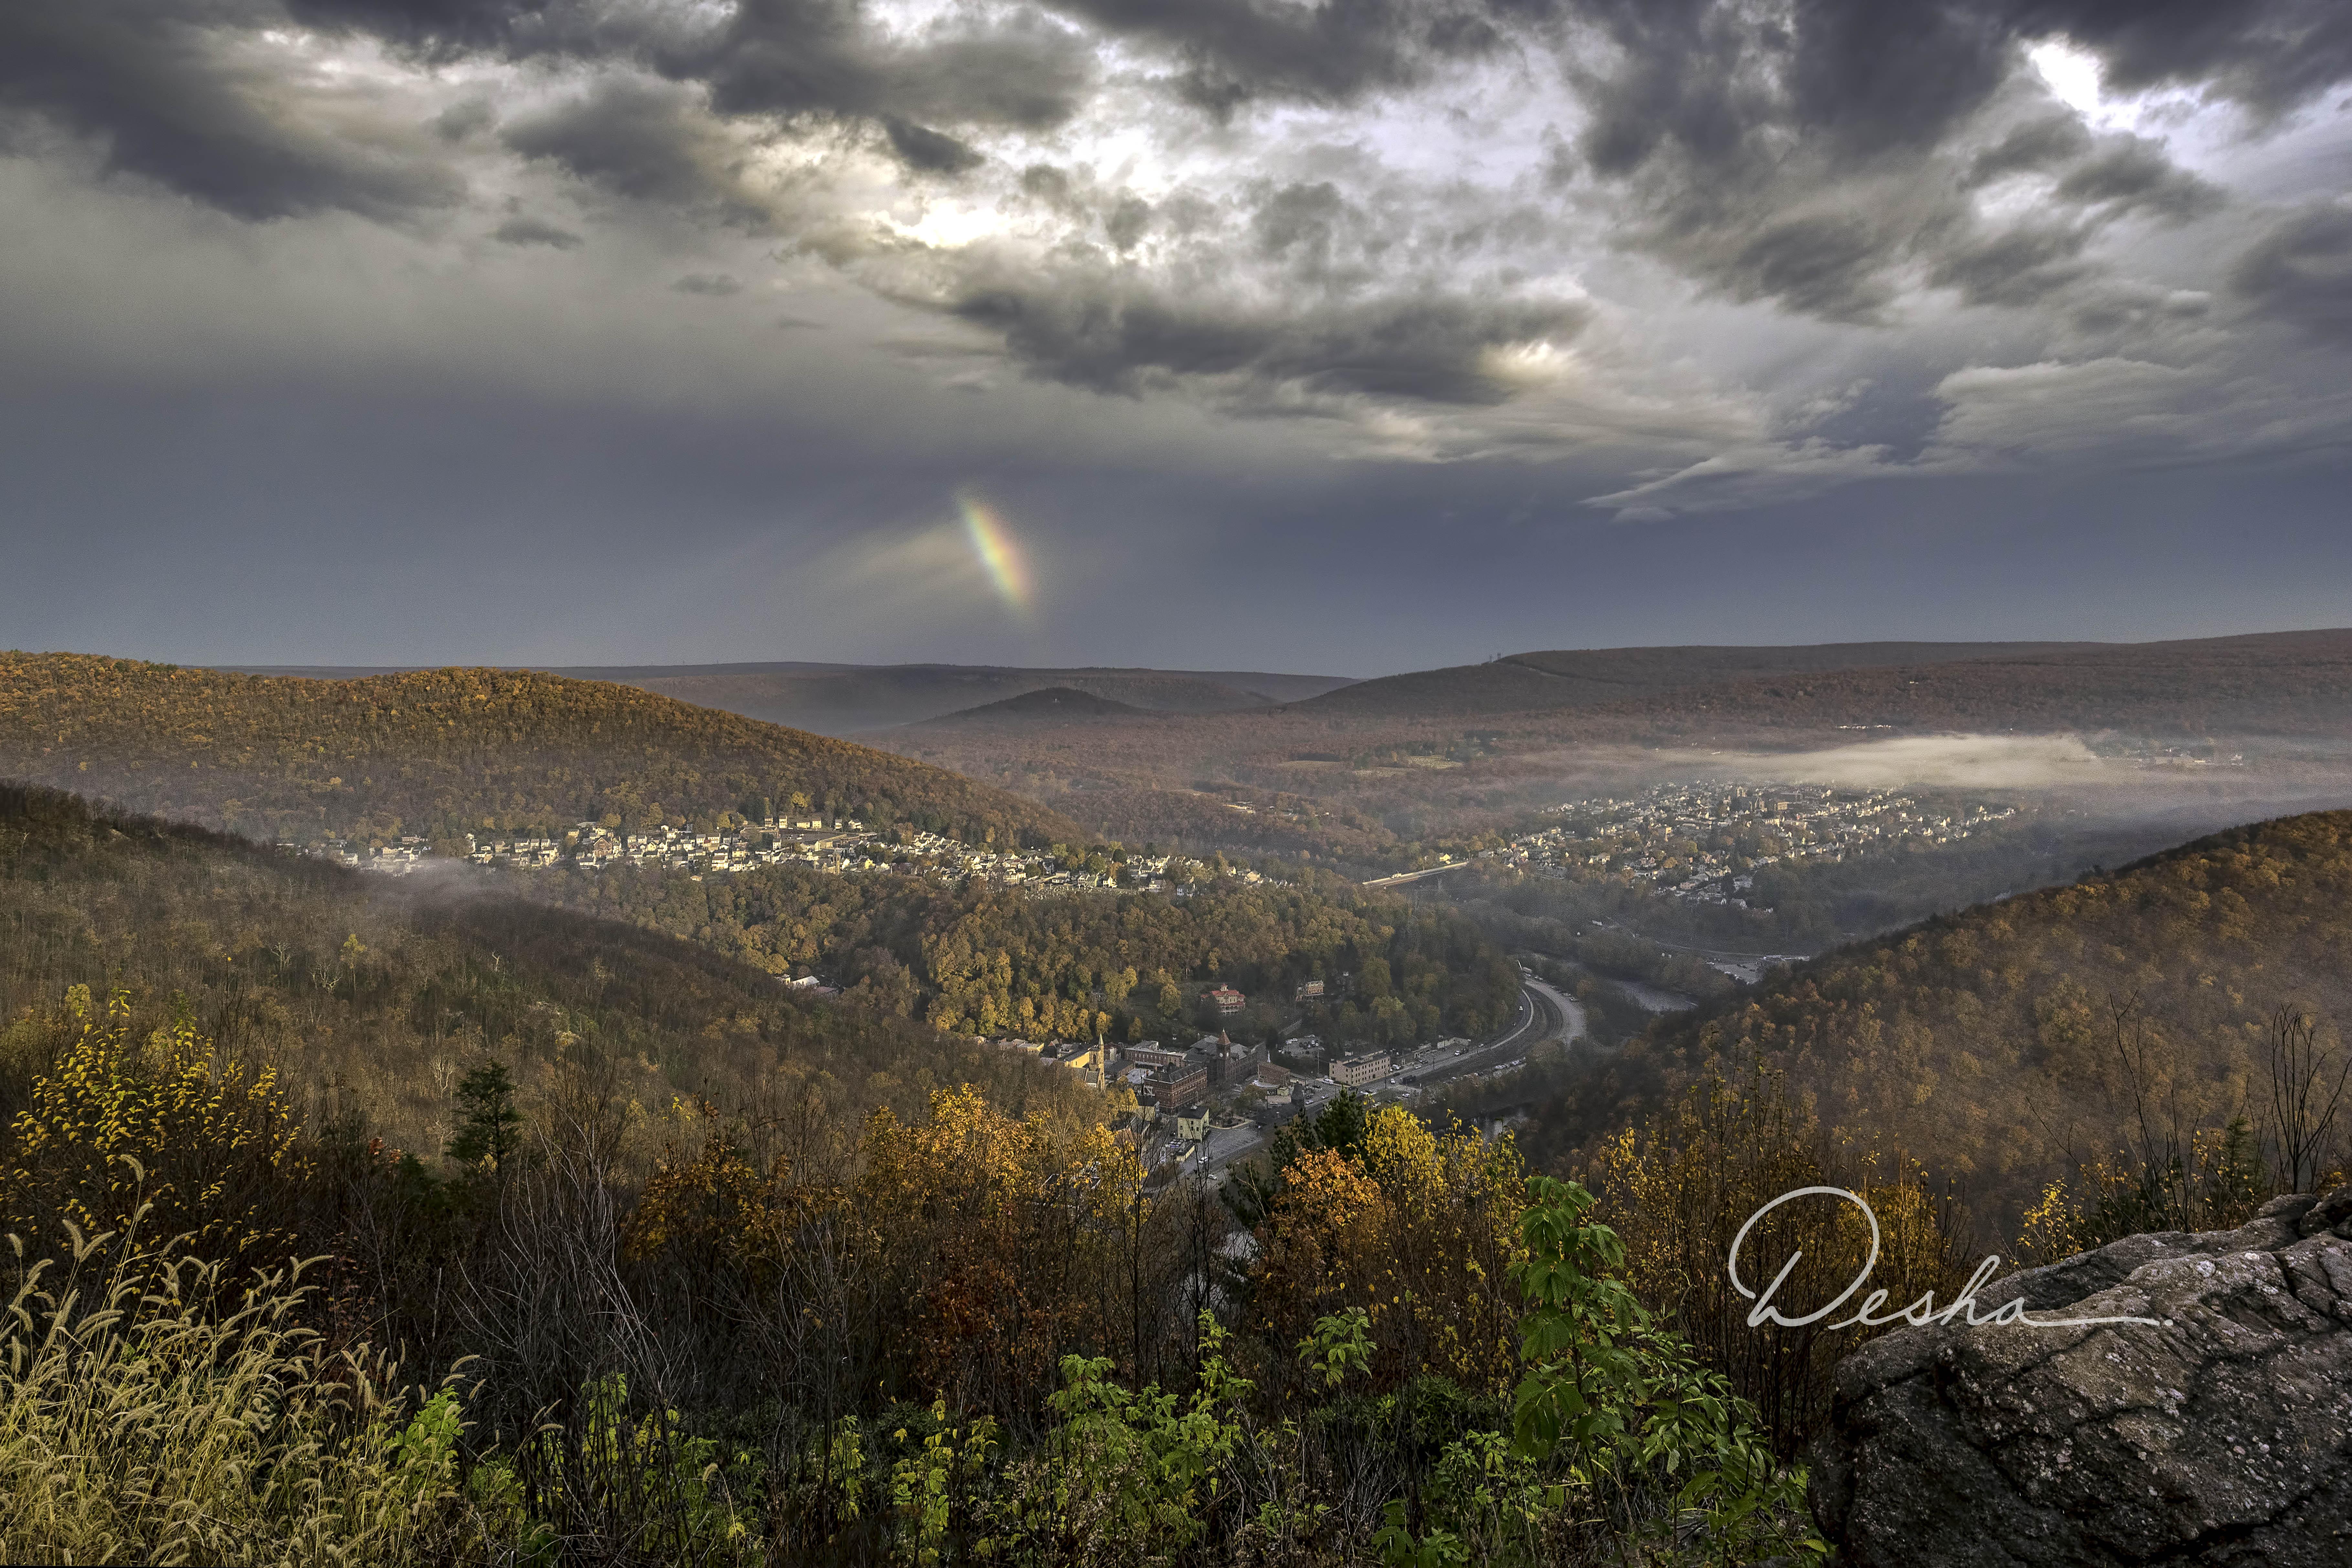 Rainbow over Jim Thorpe from Flagstaff